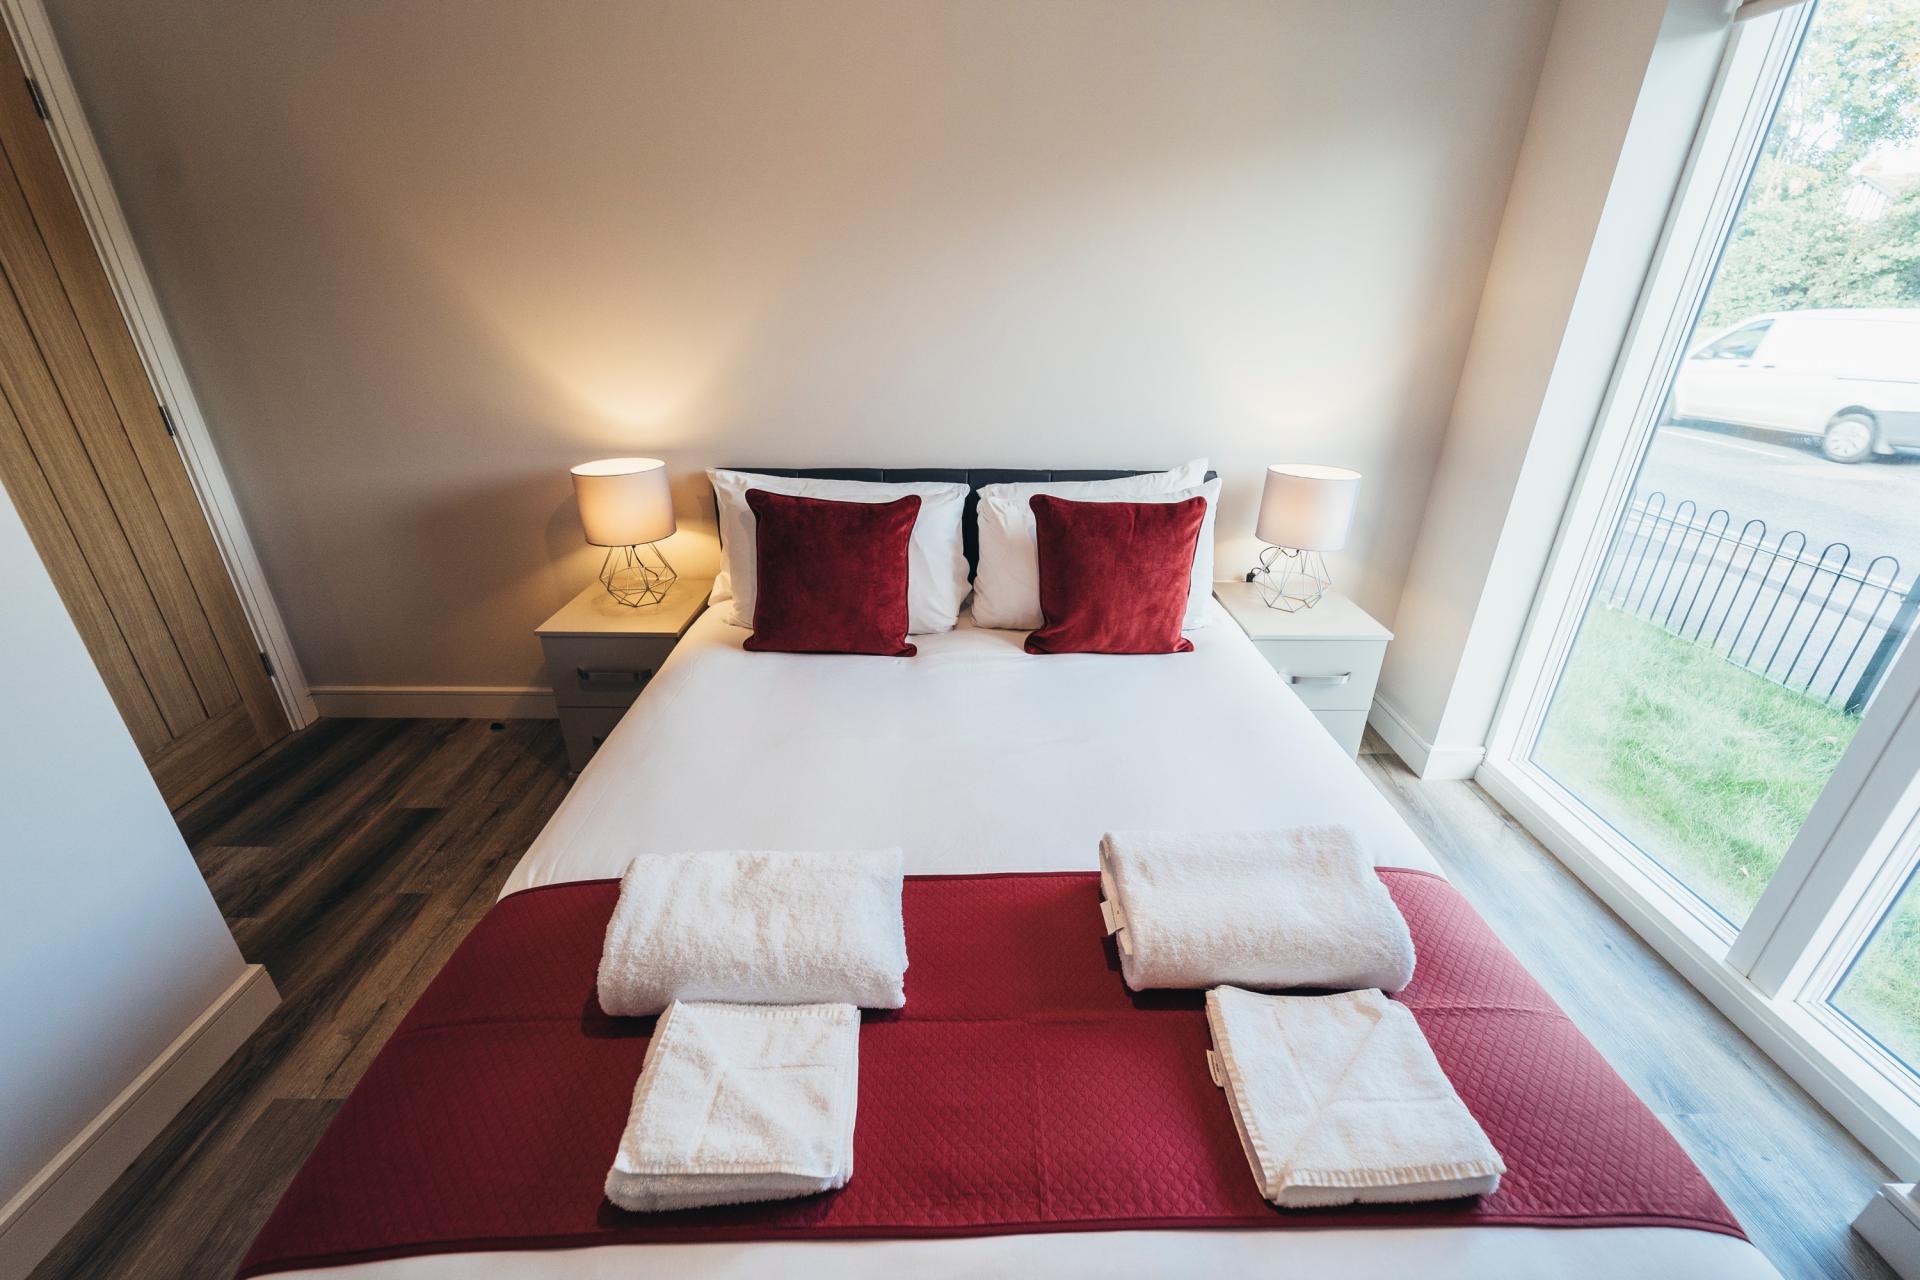 Bed at Devonshire Court Apartments, West Bridgford, Nottingham - Citybase Apartments